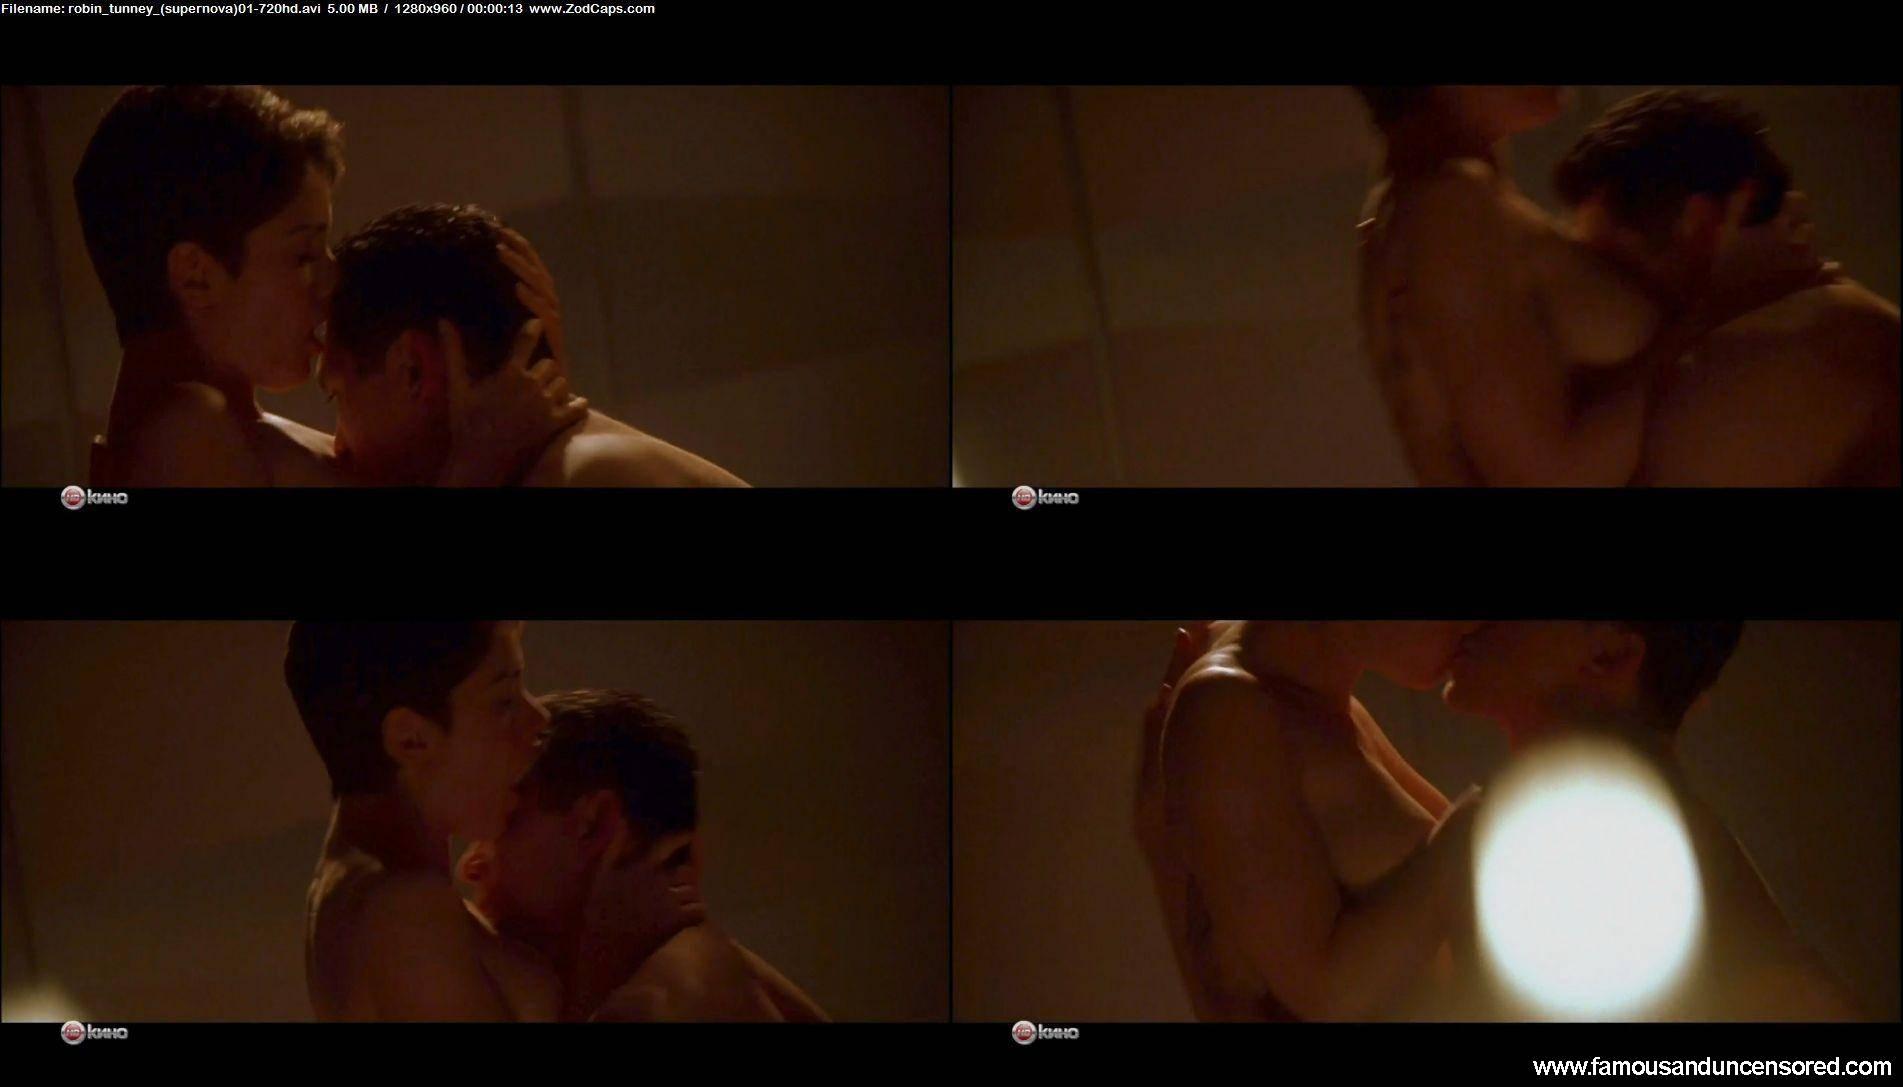 Apologise, Hot robin tunney nude pics something